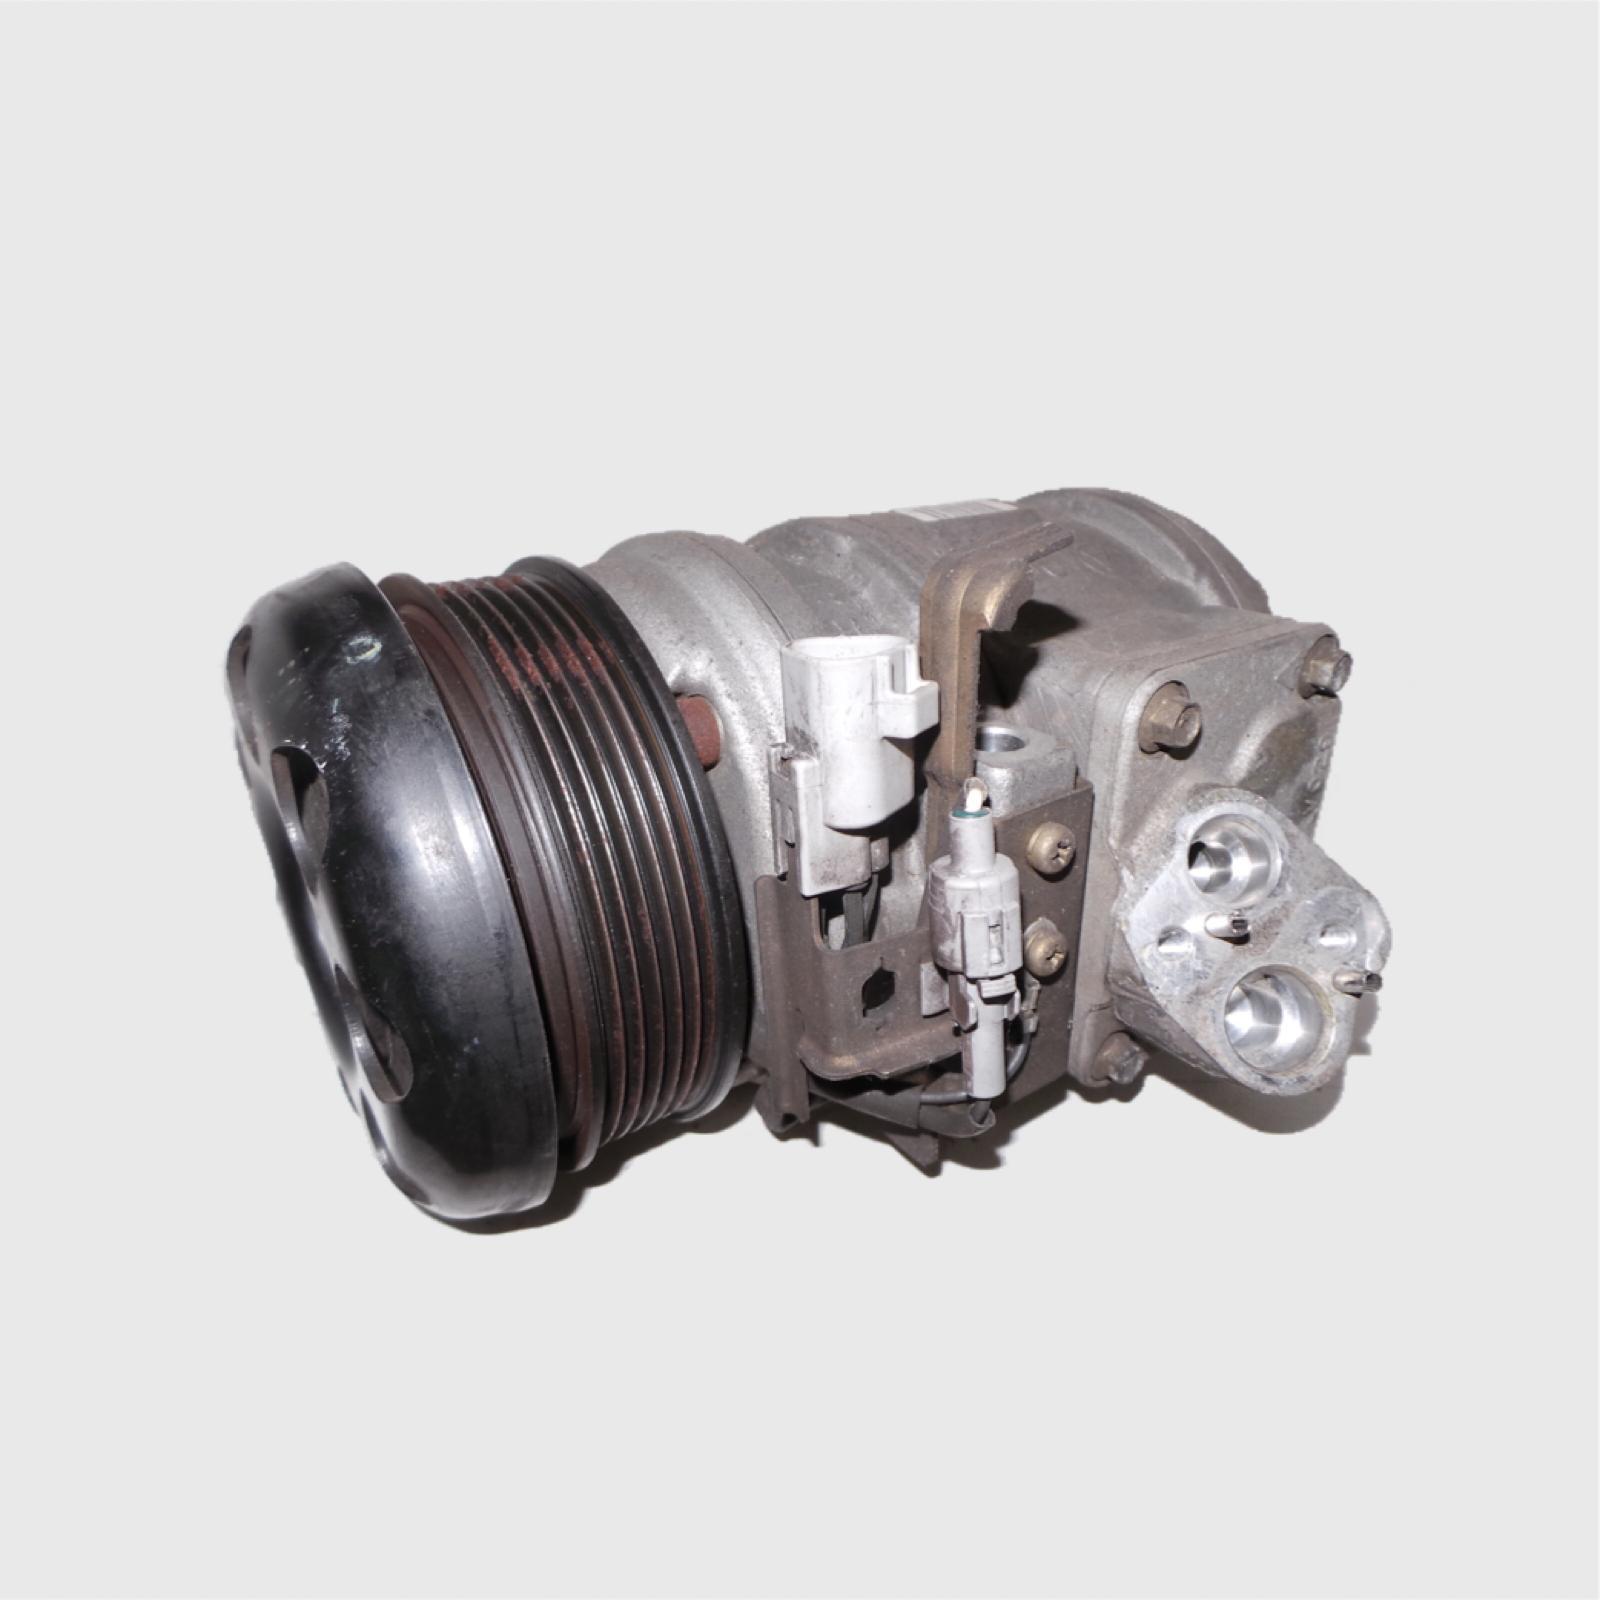 TOYOTA LANDCRUISER, A/C Compressor, 100 SERIES, 4.7, 2UZ-FE, PETROL, ND P/N 10PA20C, 01/98-10/07